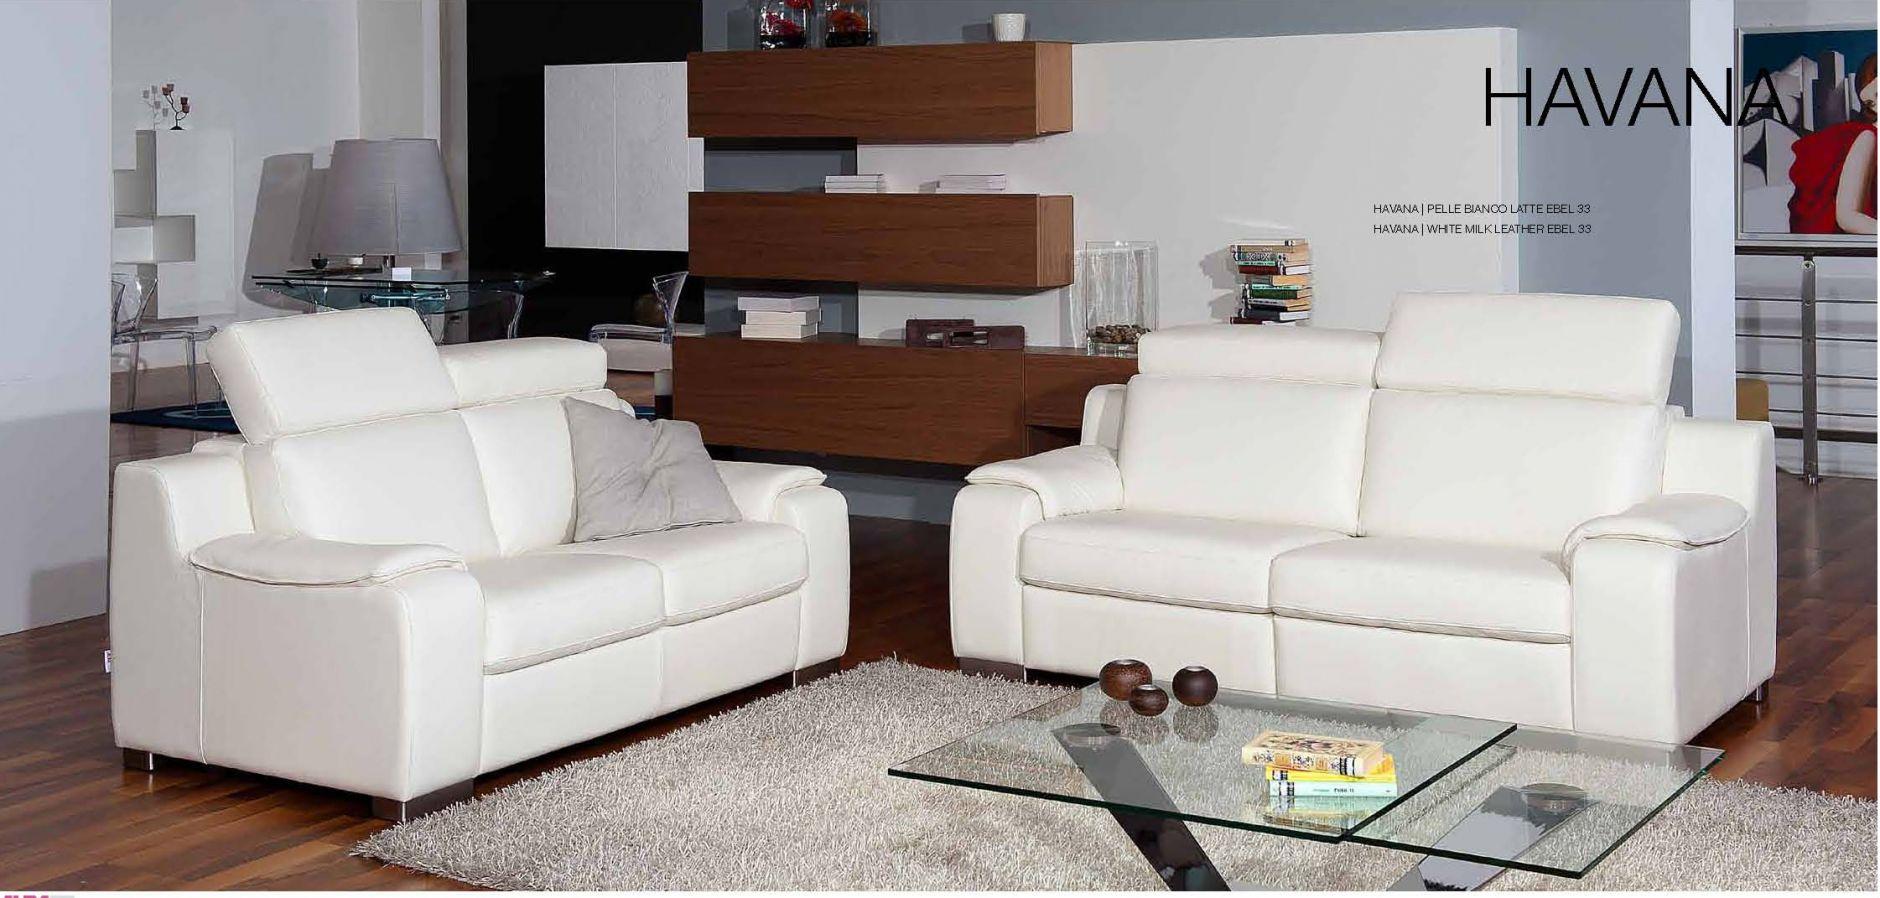 canap s italiens alpa salotti canap s rie la havaneles. Black Bedroom Furniture Sets. Home Design Ideas